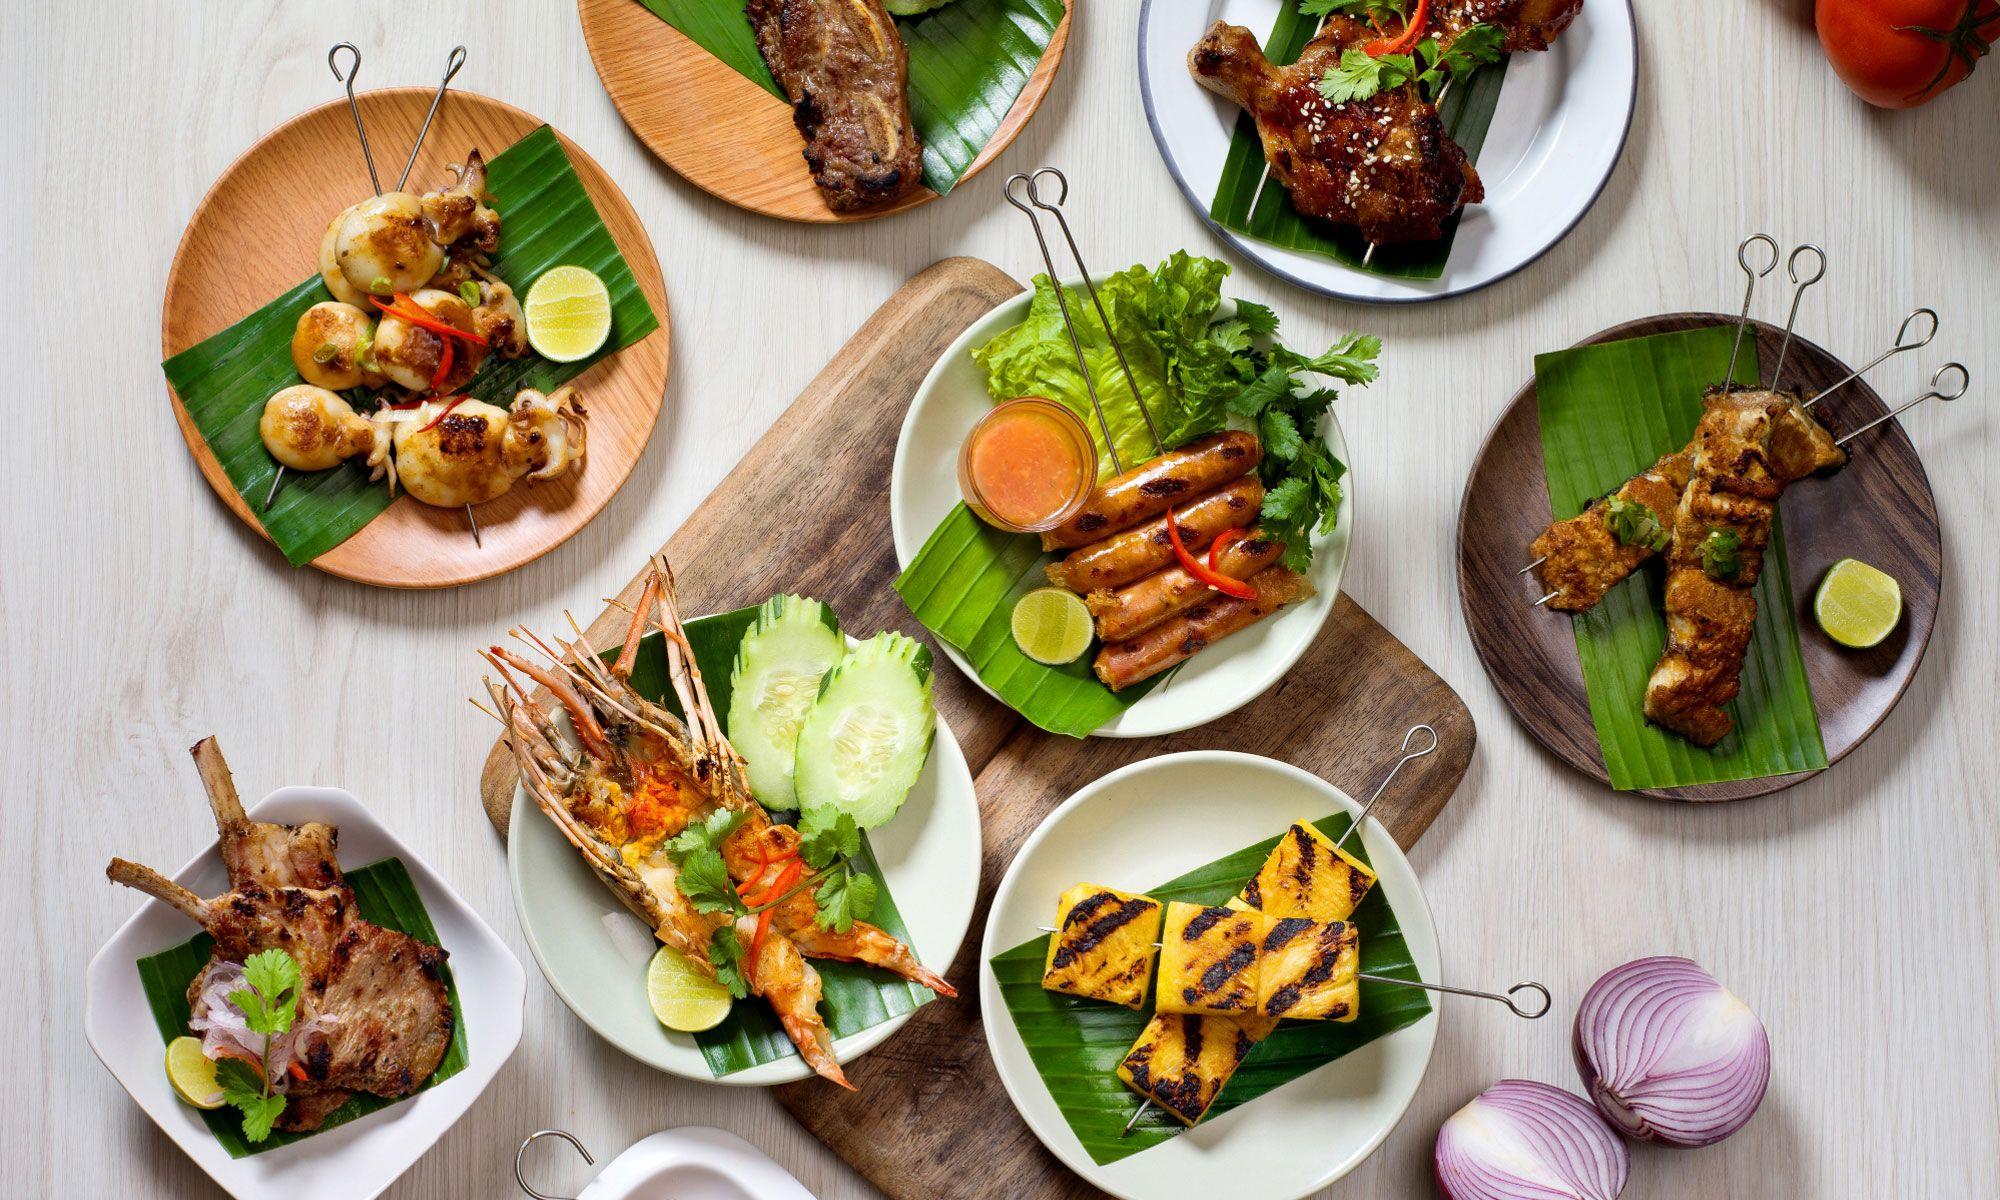 Thai Grill Party At Mango Tree Café